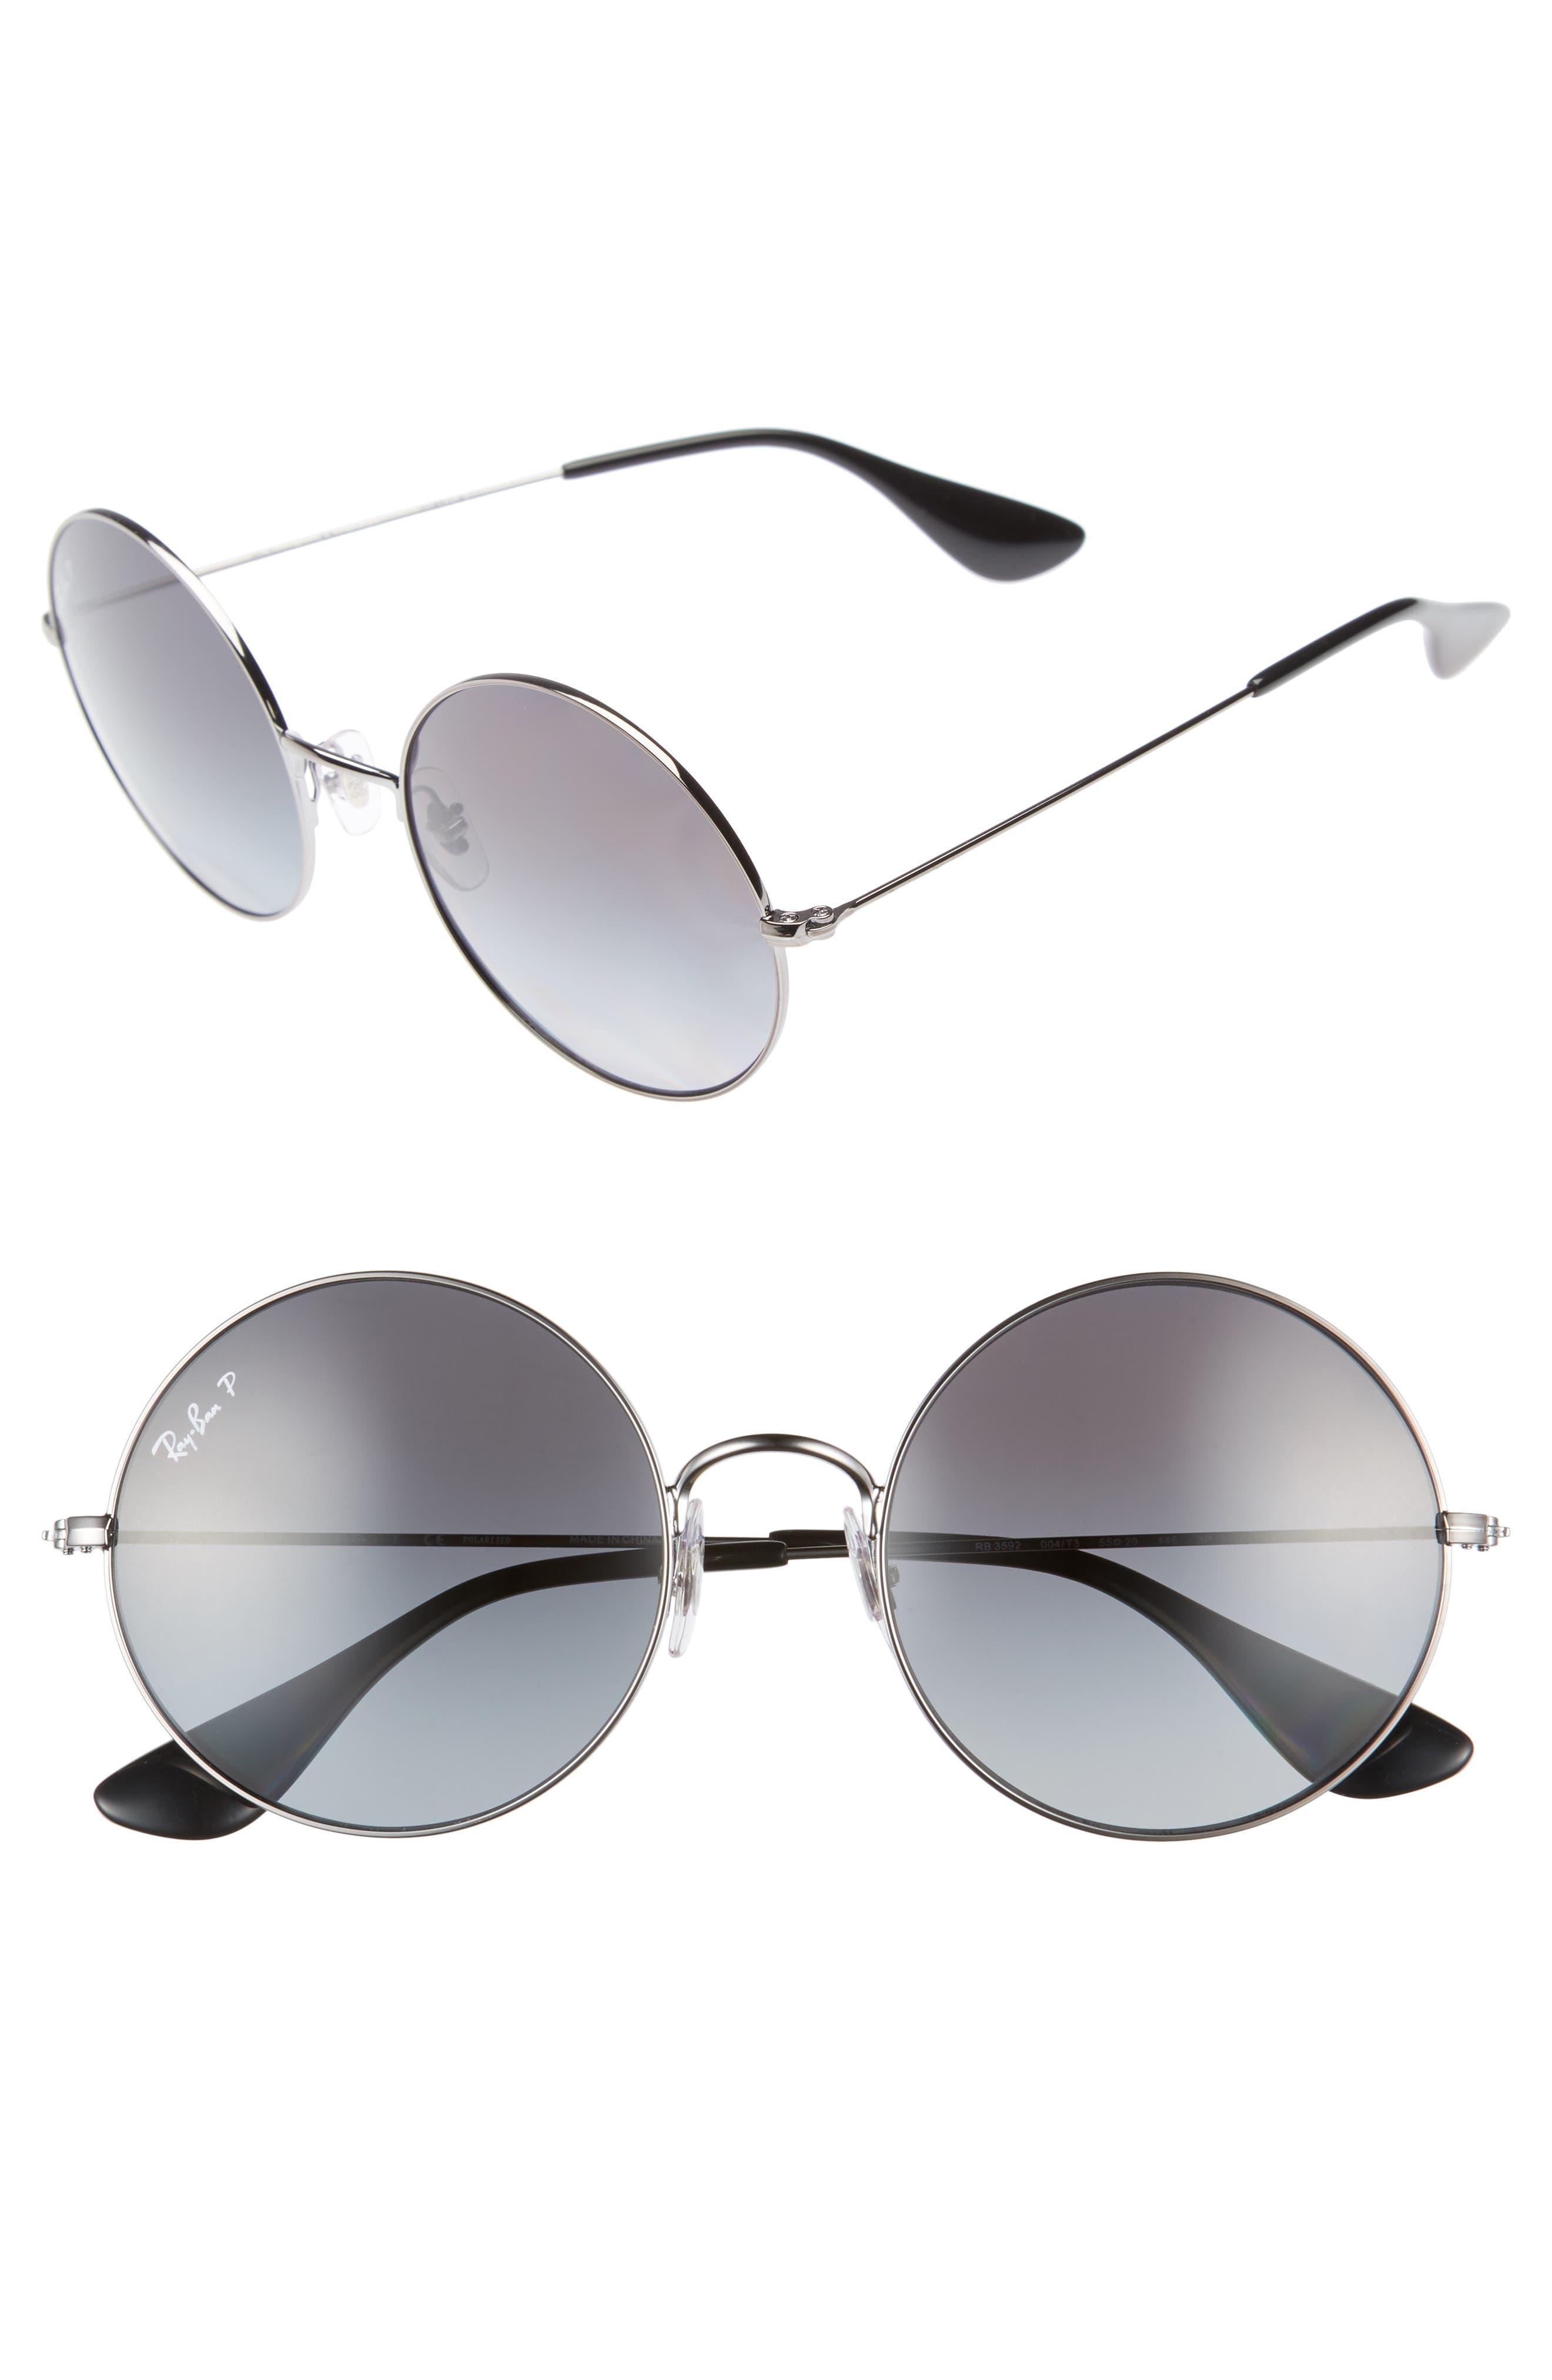 Ray-Ban 55mm Polarized Round Sunglasses